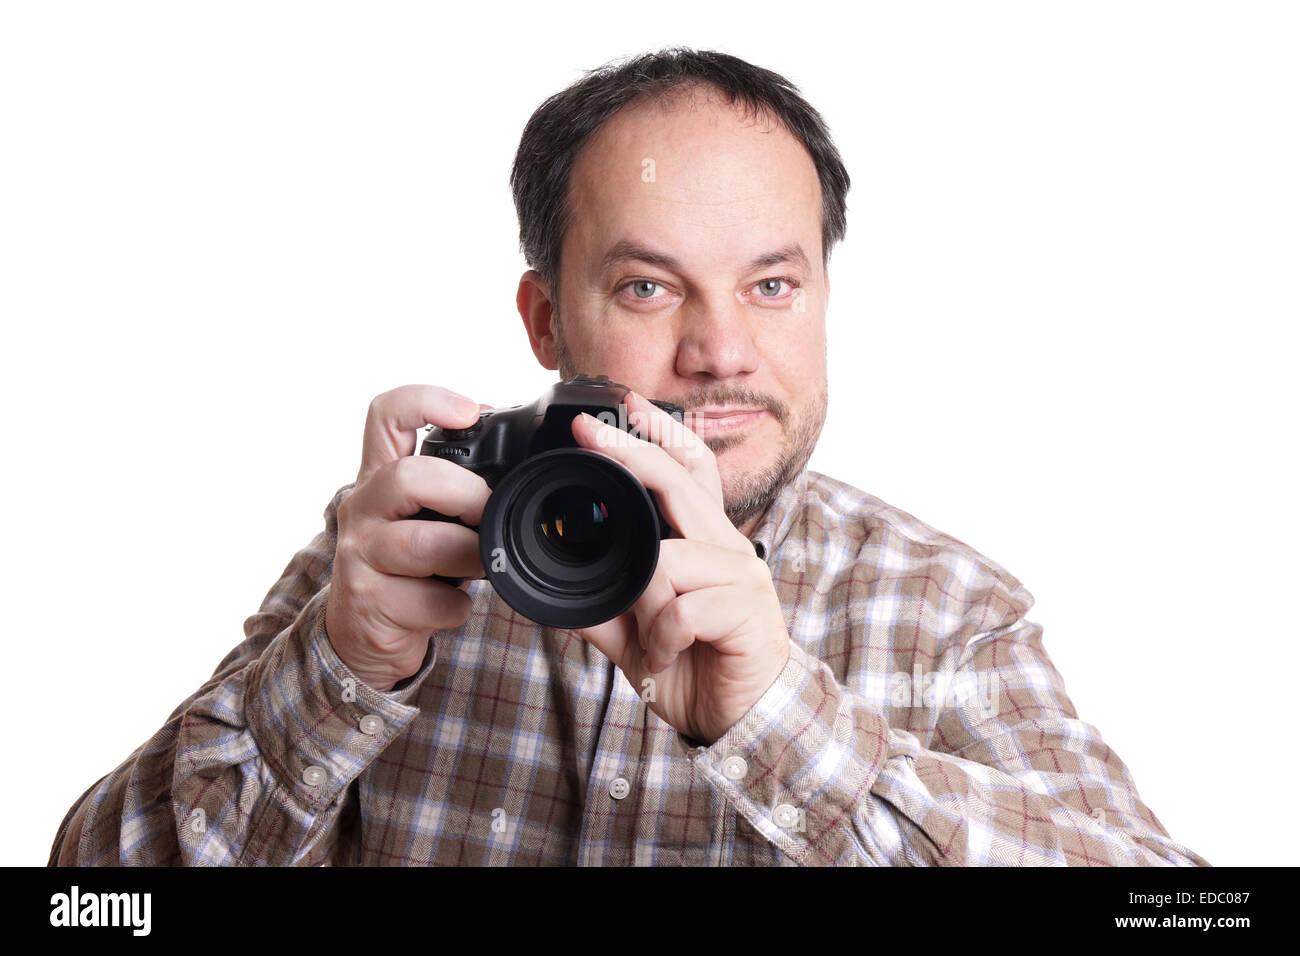 man with dslr camera - Stock Image